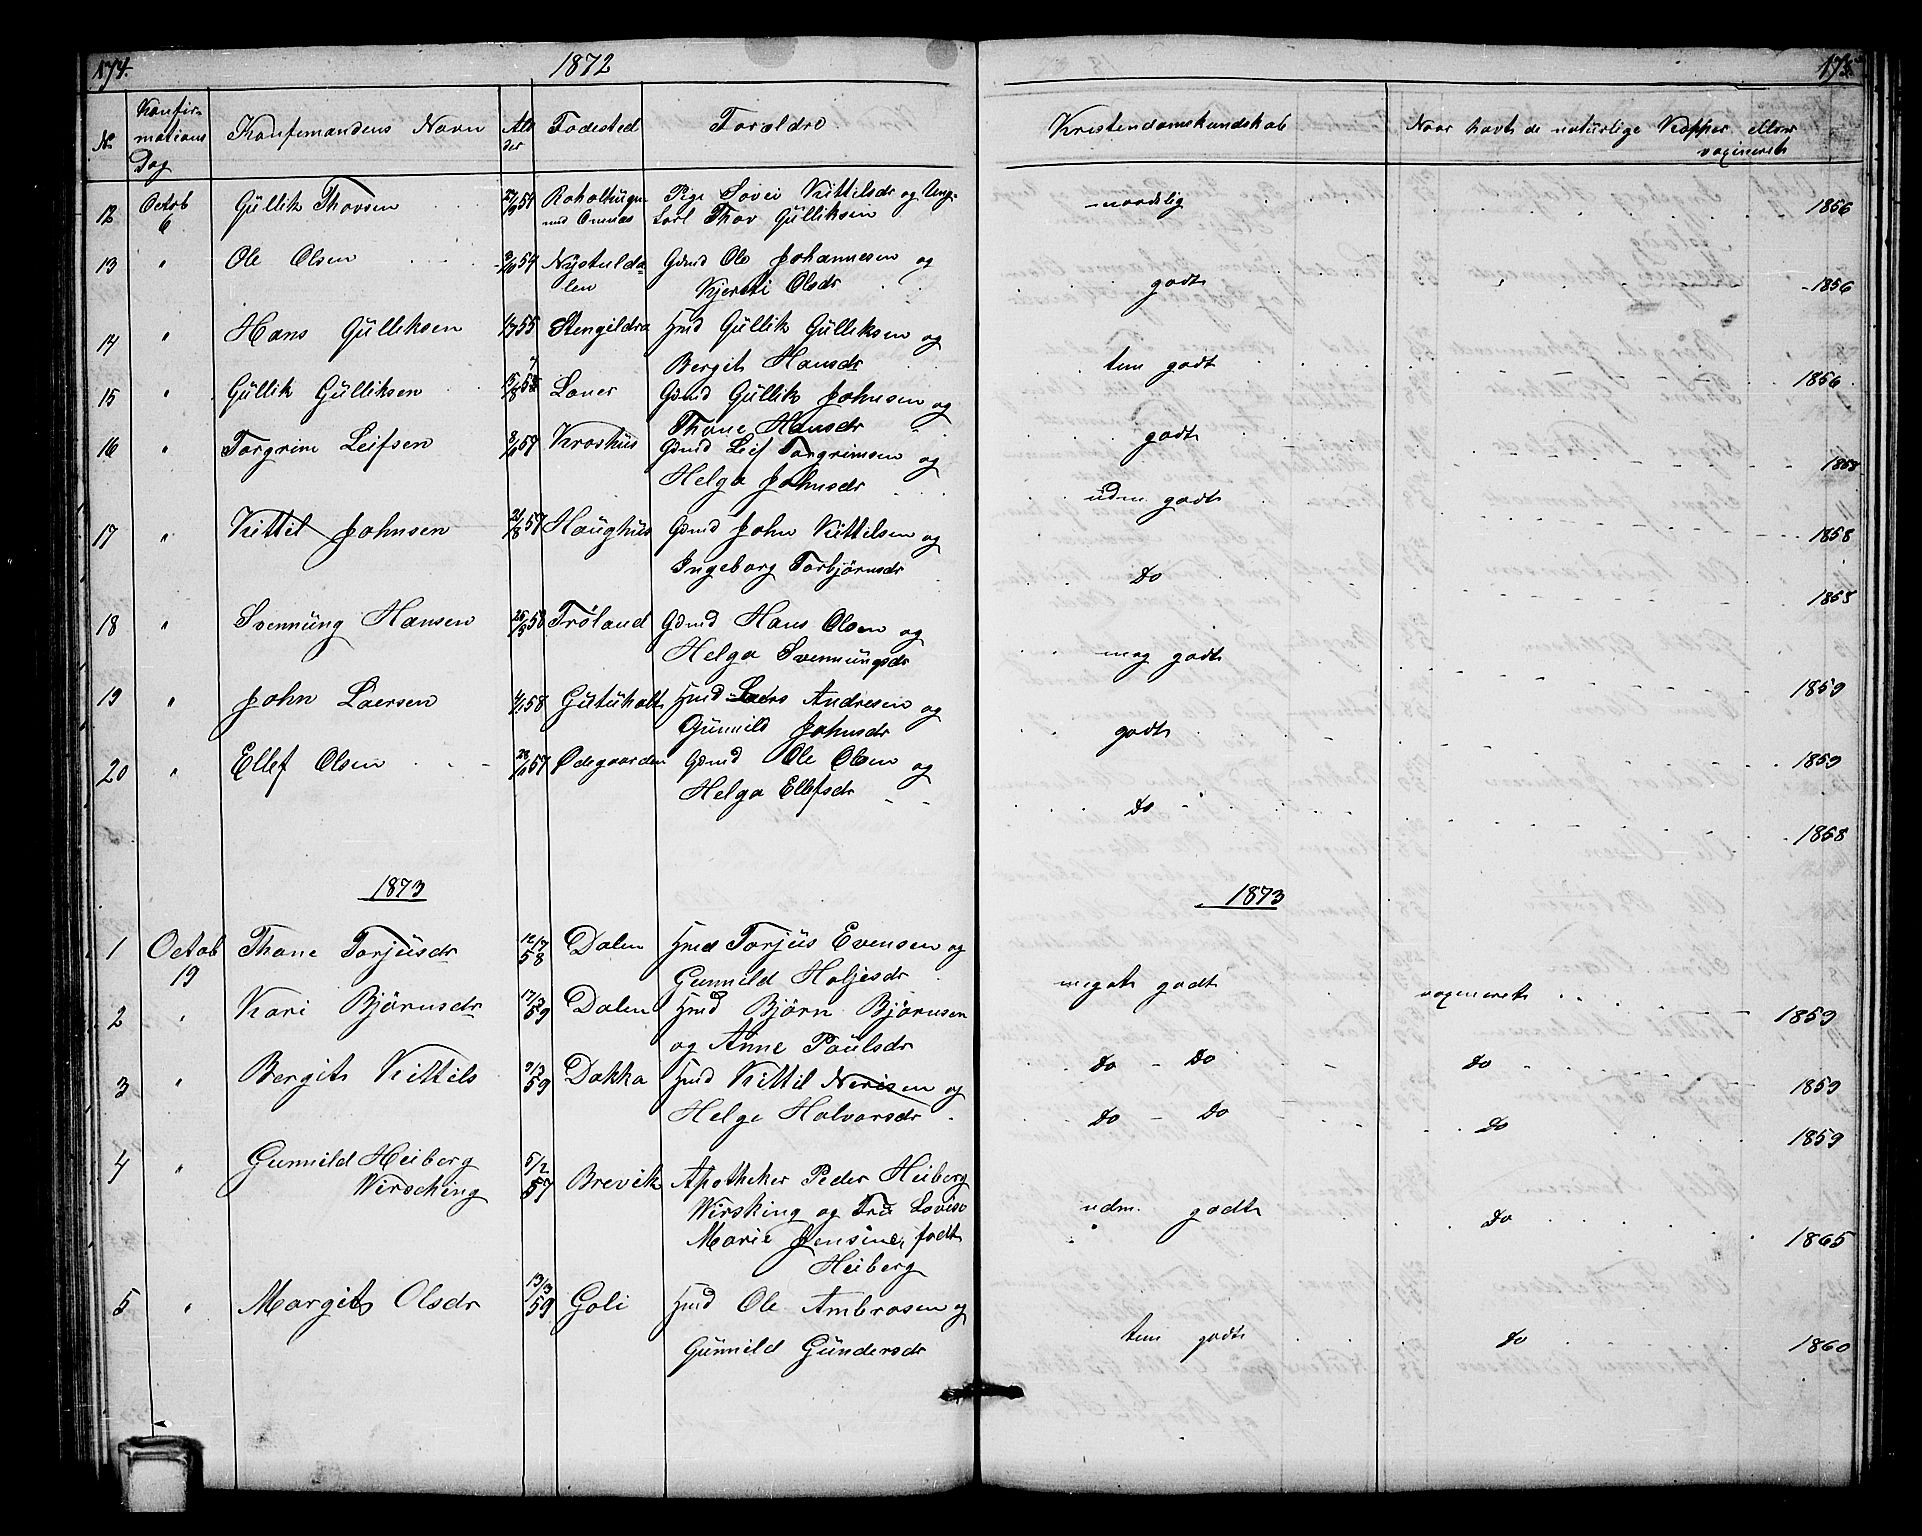 SAKO, Hjartdal kirkebøker, G/Gb/L0002: Klokkerbok nr. II 2, 1854-1884, s. 174-175